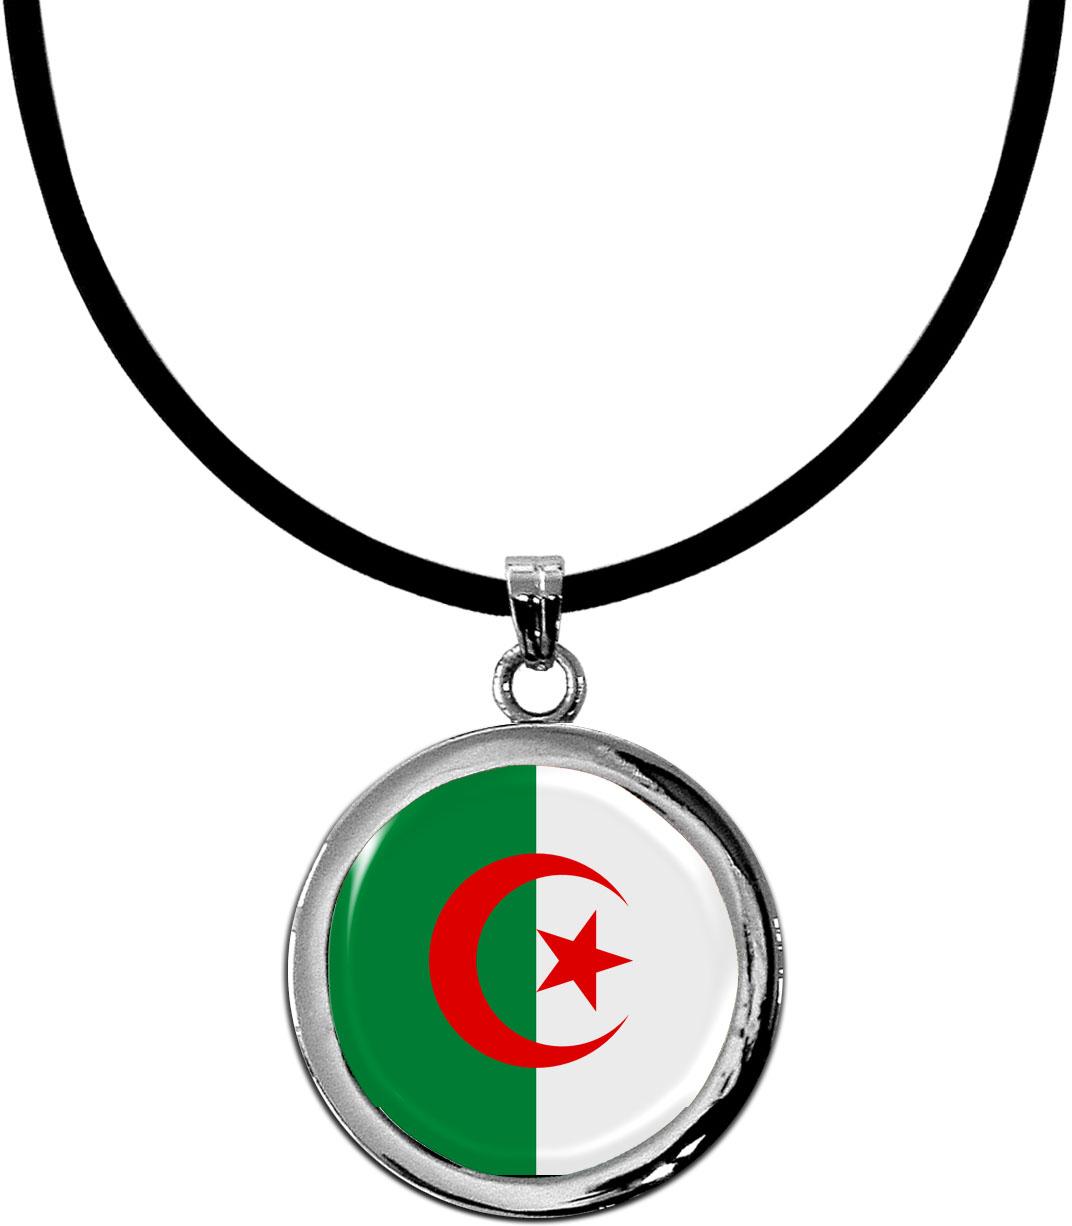 Kettenanhänger / Algerien / Silikonband mit Silberverschluss